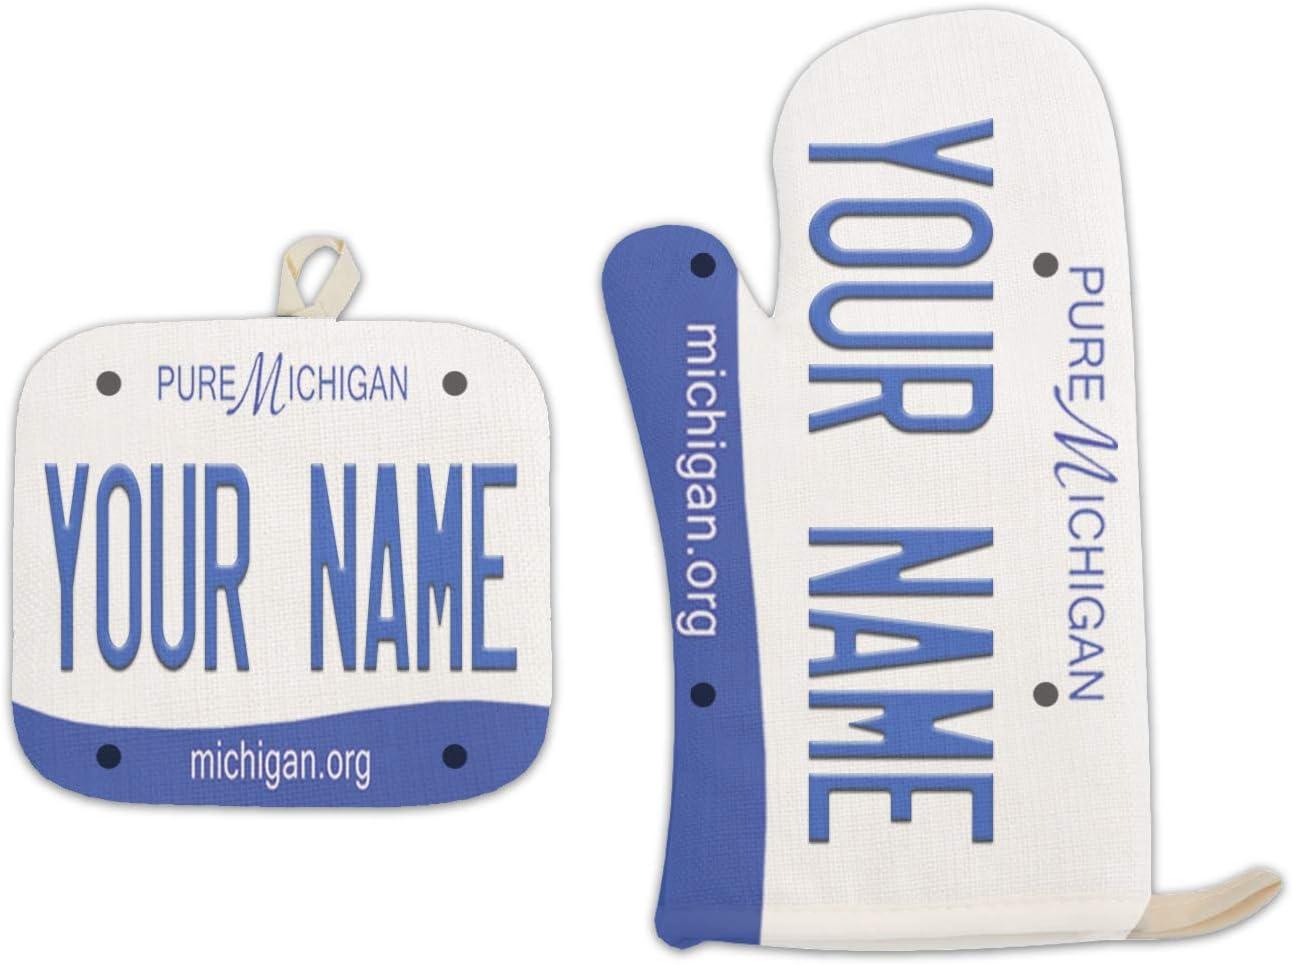 Bleu Reign BRGiftShop Personalized Custom Name 2016 Michigan State License Plate Linen Oven Mitt and Potholder Set